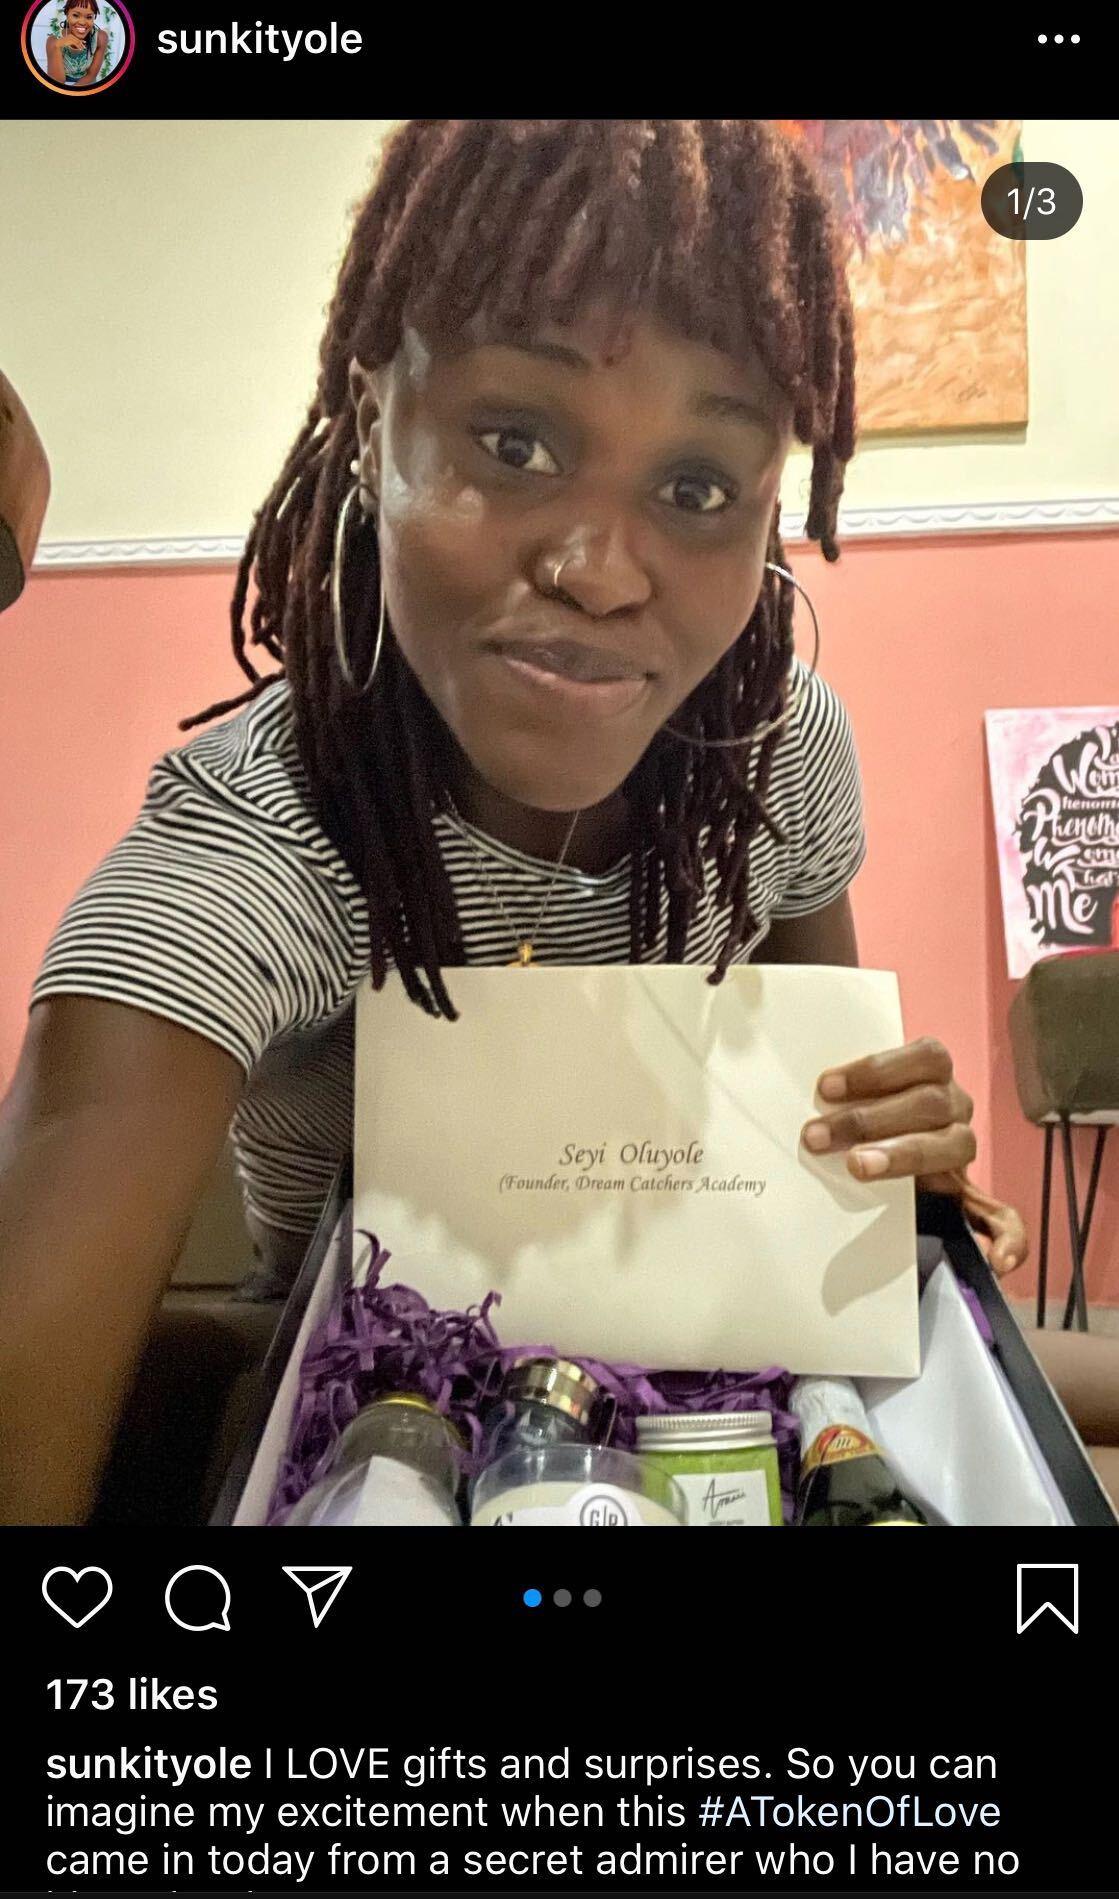 Suspense as humanitarians receive pleasant gifts from secret Valentine